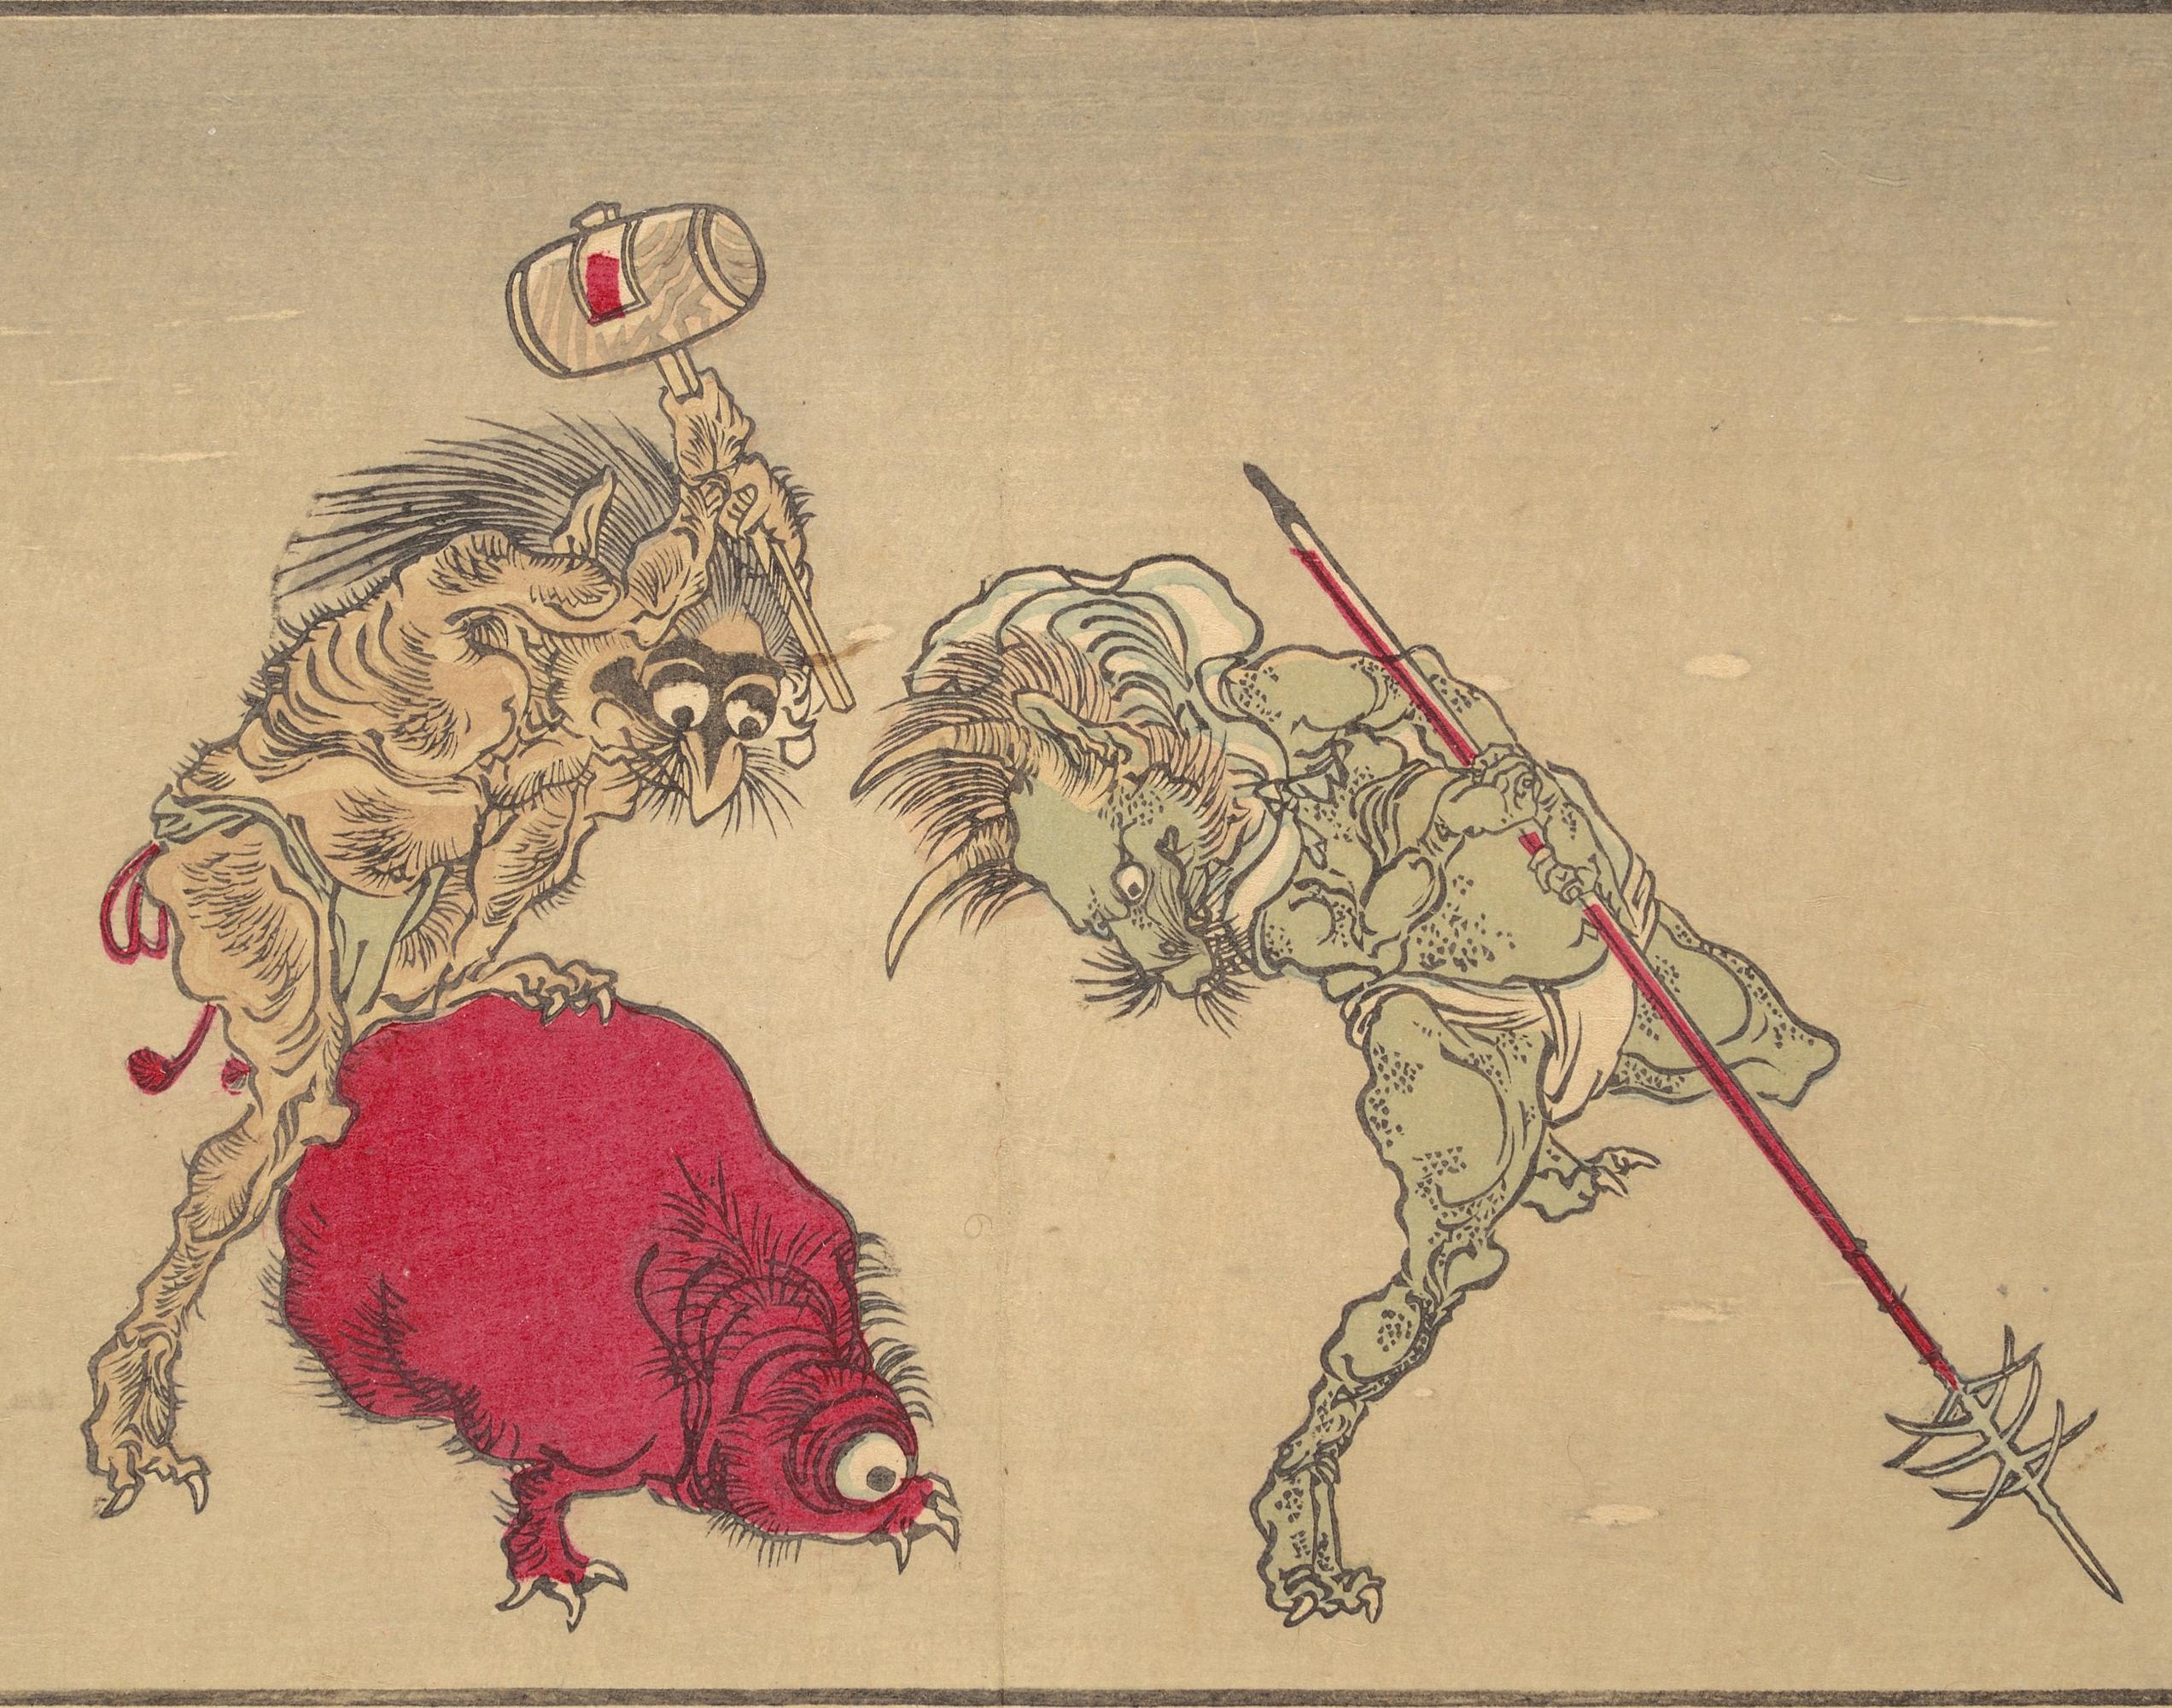 http://upload.wikimedia.org/wikipedia/commons/b/b0/Kyosai%2C_Yokai_image.jpg